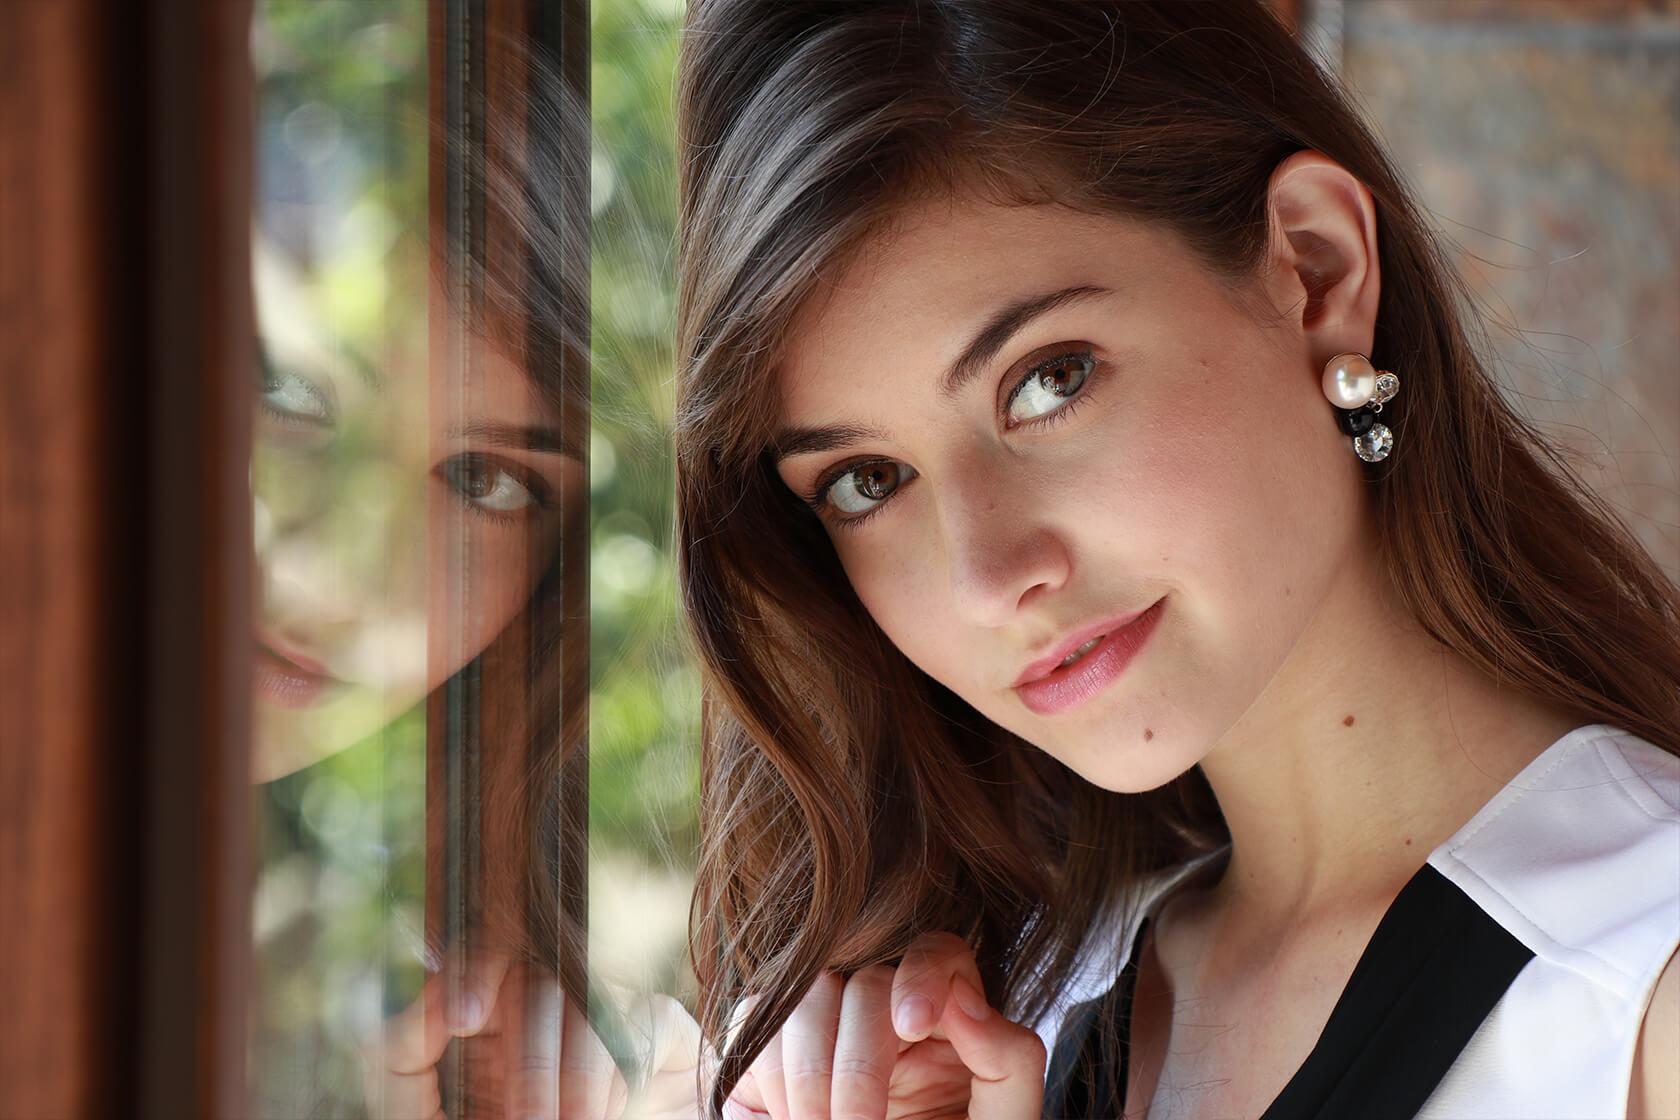 Ef M 18 150mm F 35 63 Is Stm Canon Australia Skun Female Medium 5 X 14 Mm Portrait Of A Young Woman